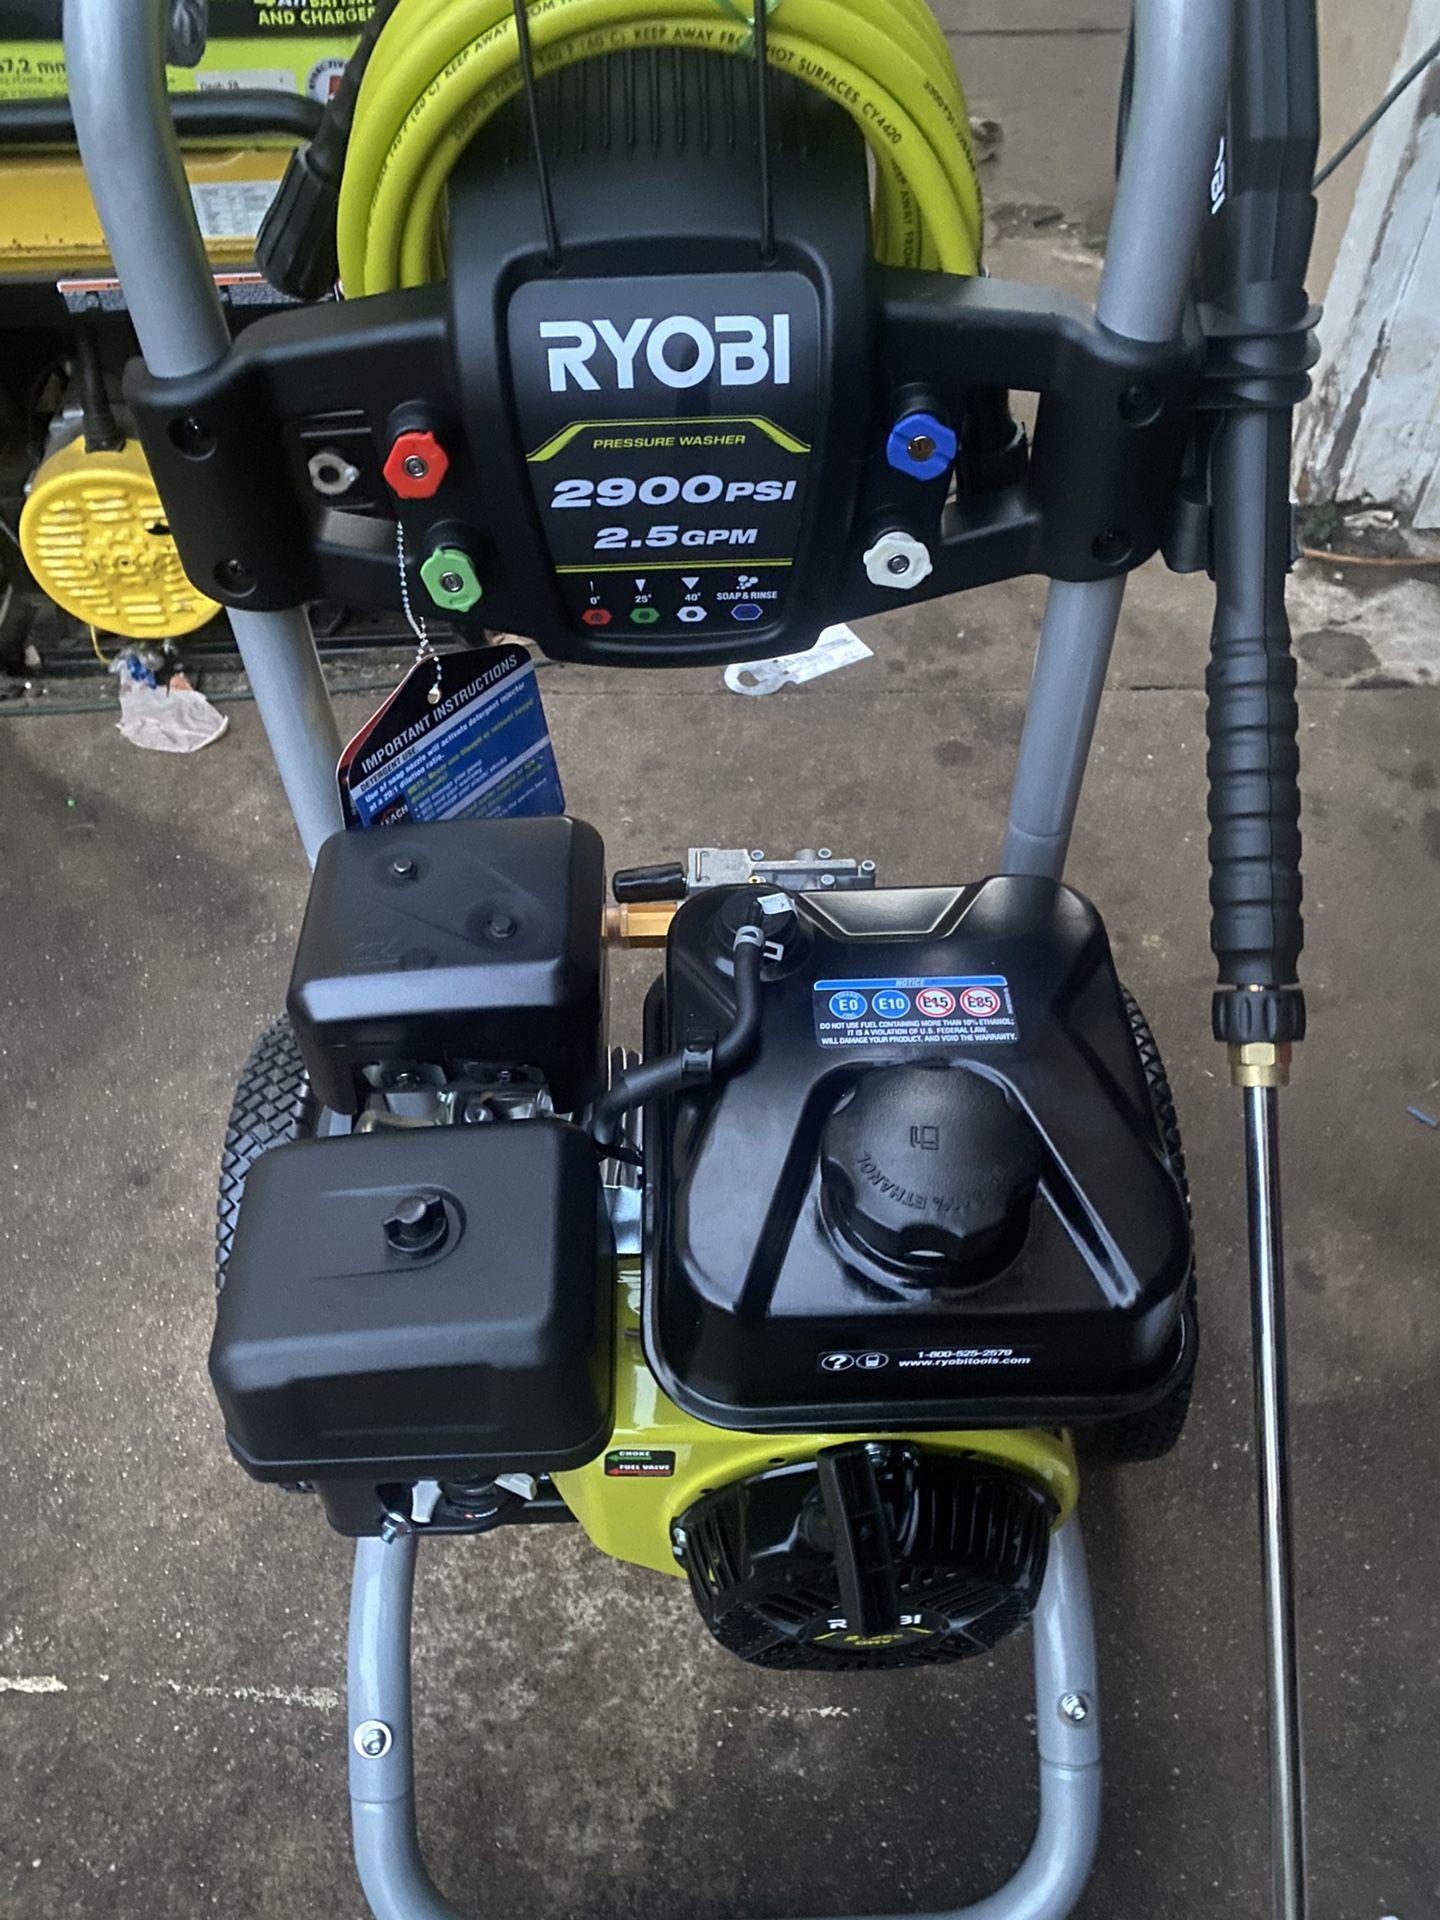 RYOBI 2,900 PSI 2.5 GPM Cold Water Gas Pressure Washer